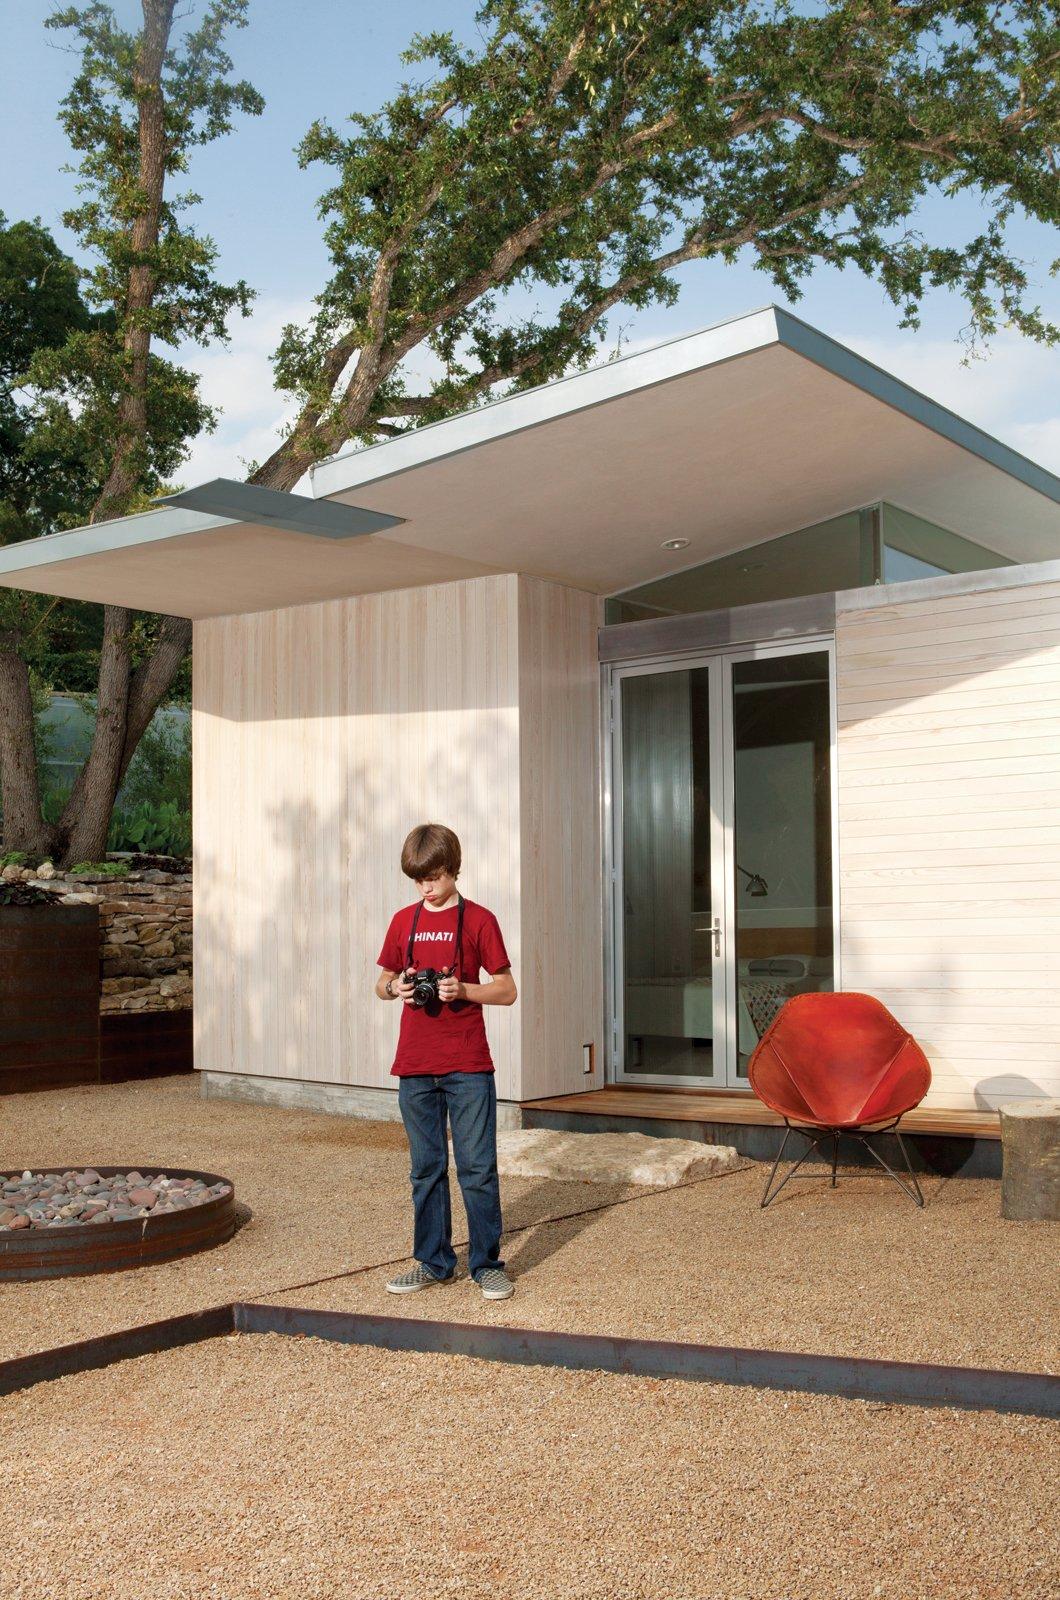 Articles about mid century renovation washington on Dwell.com